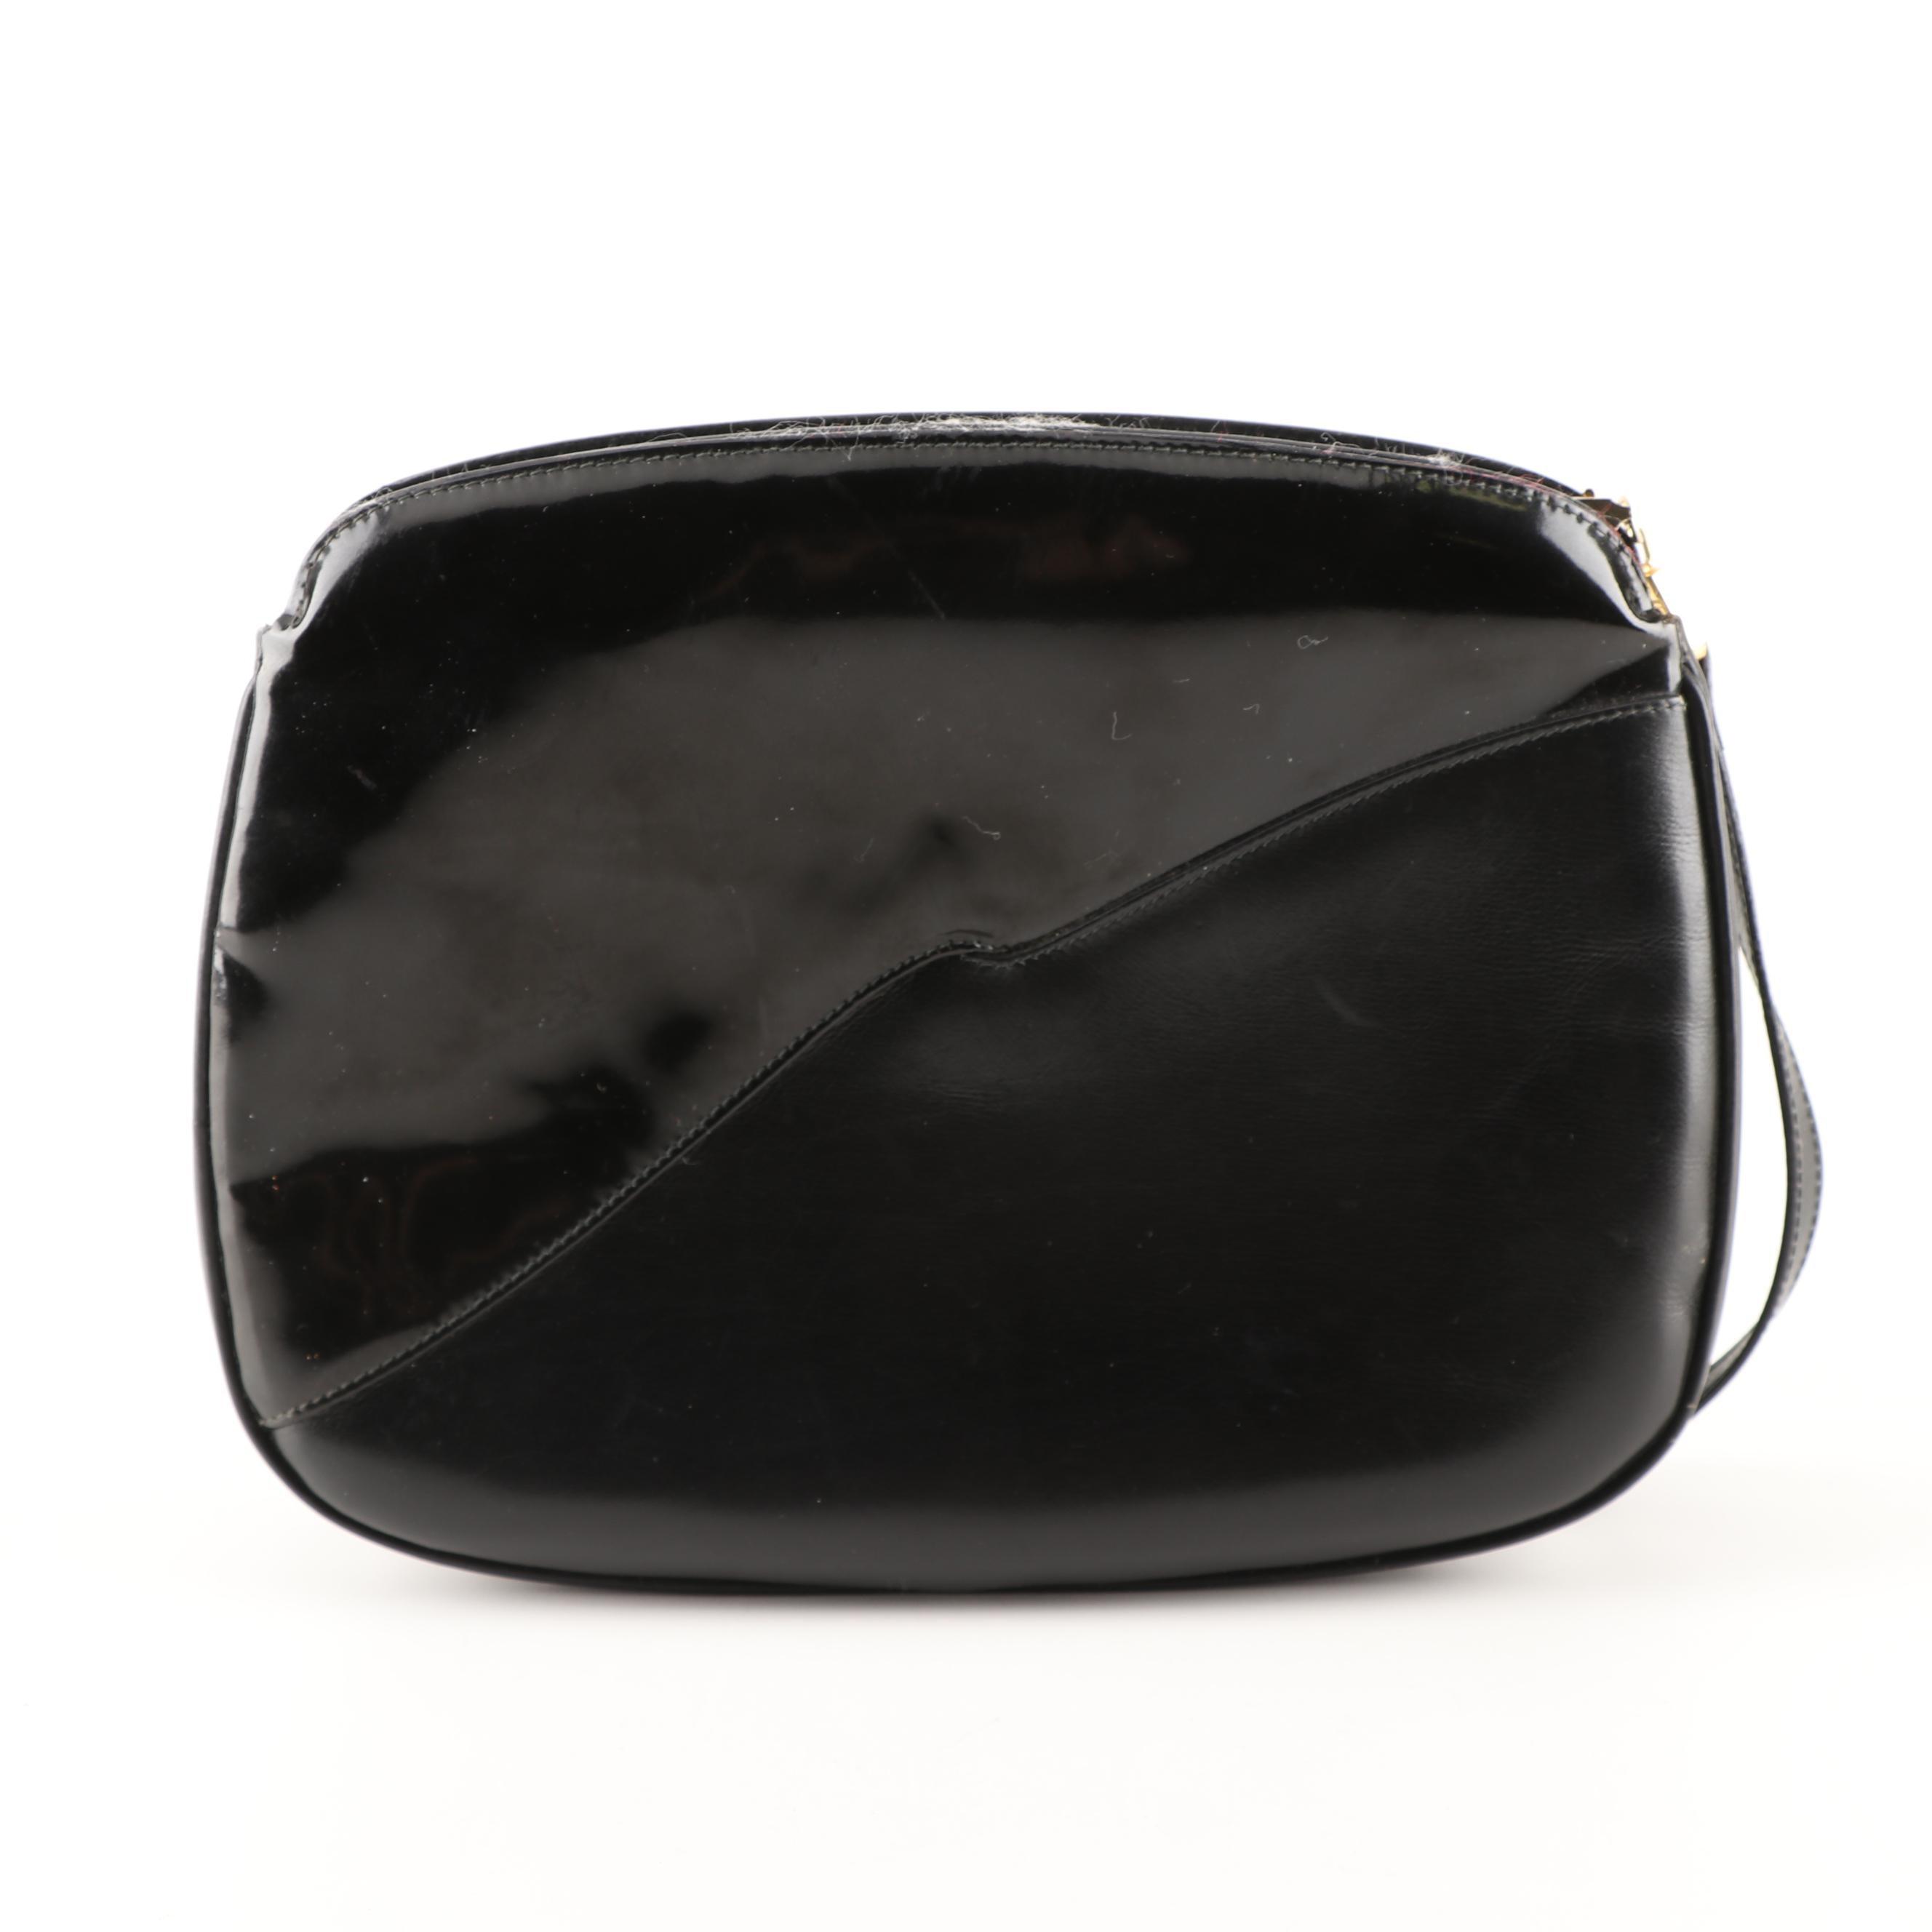 Salvatore Ferragamo Black Calfskin and Patent Leather Shoulder Bag